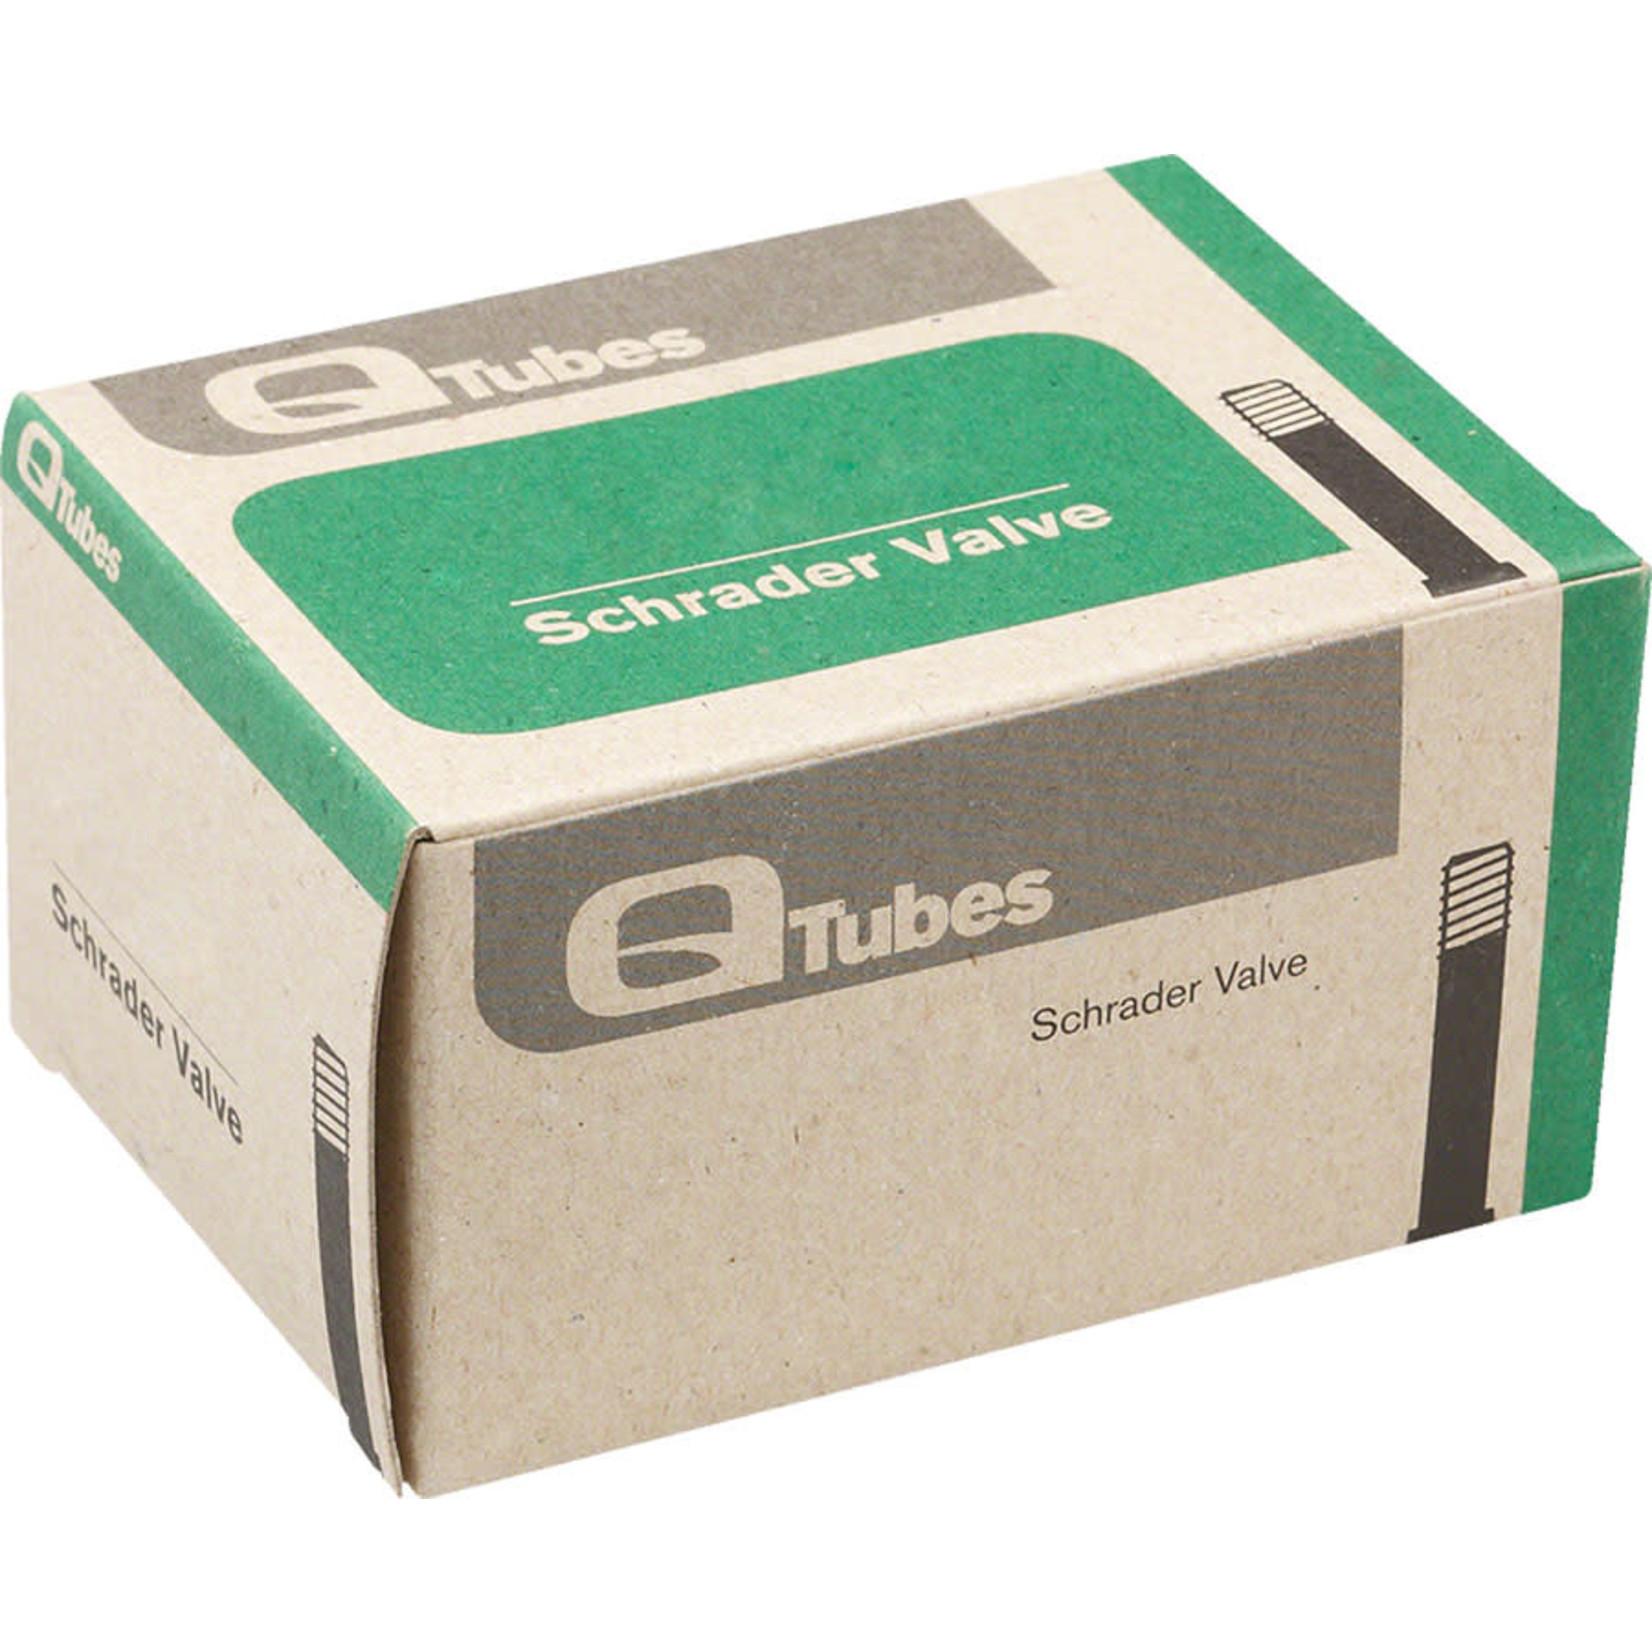 "Q-Tubes Q-Tubes Value Series Tube with Schrader Valve: 27"" x 1"" (700 x 18-25mm)"